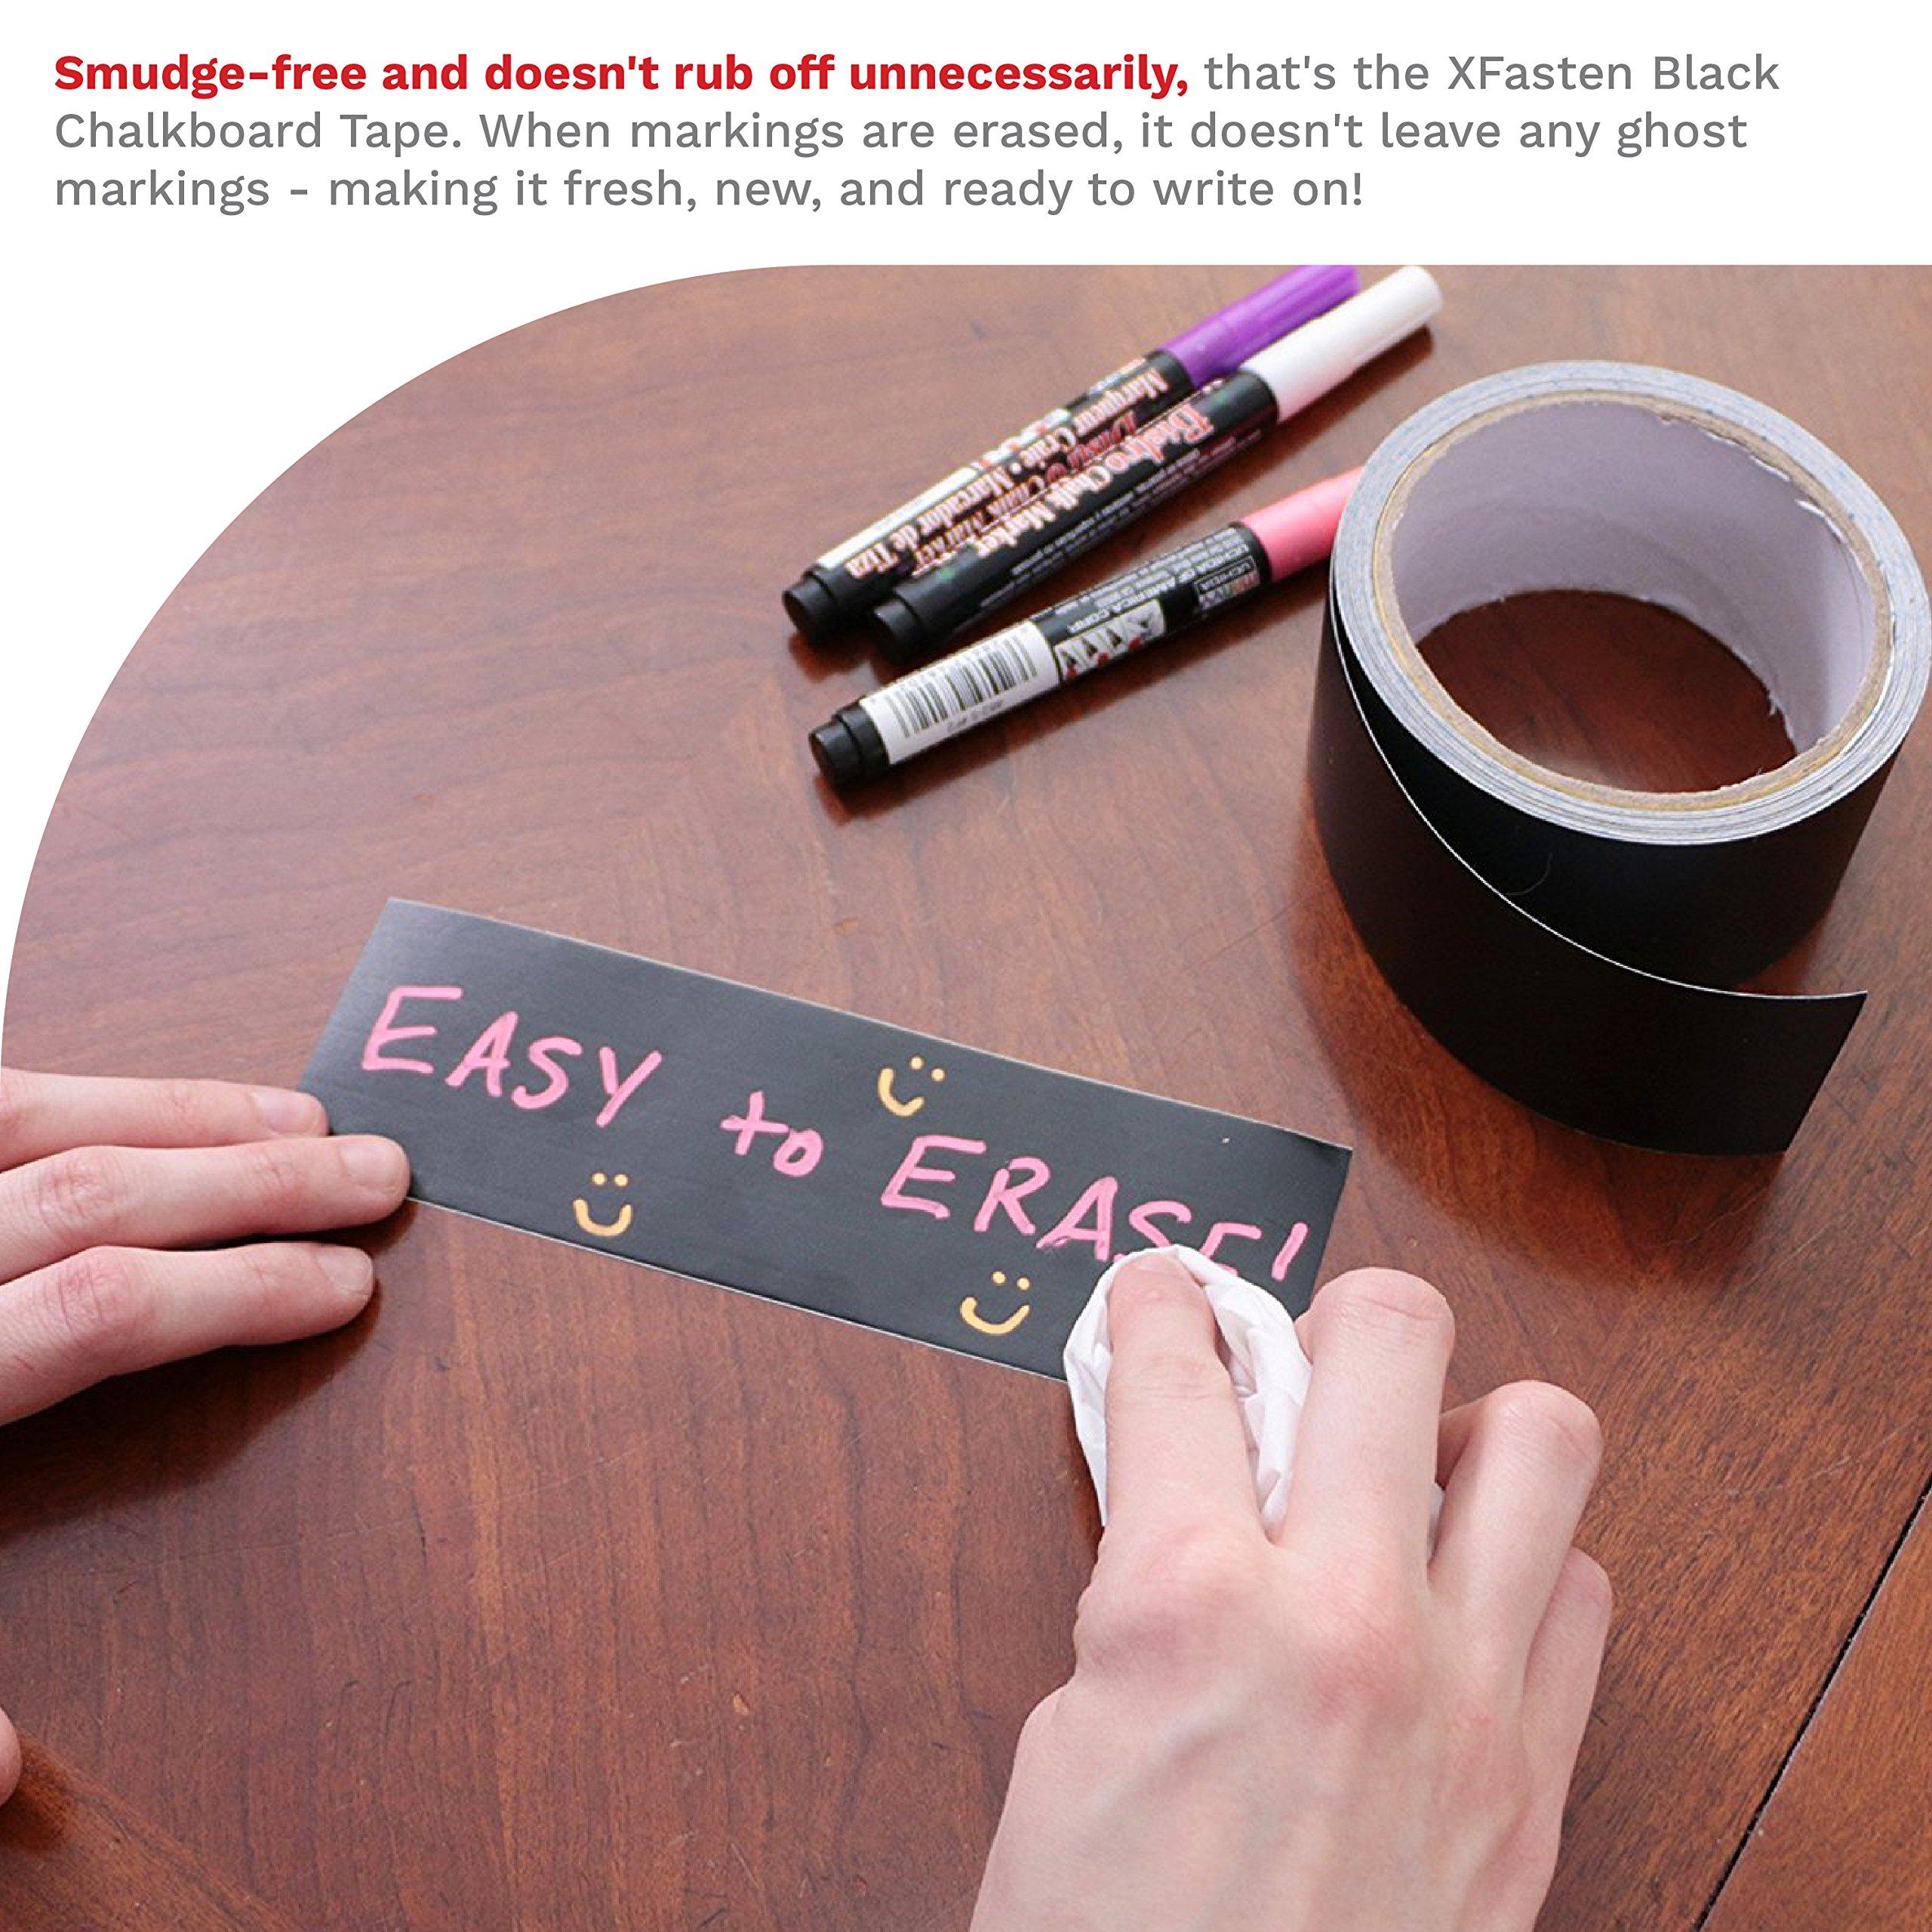 XFasten Black Chalkboard Tape Removable, 2-Inch x 30-Foot, Black, Smudge Resistant Sticky Chalkboard Label Duct Tape